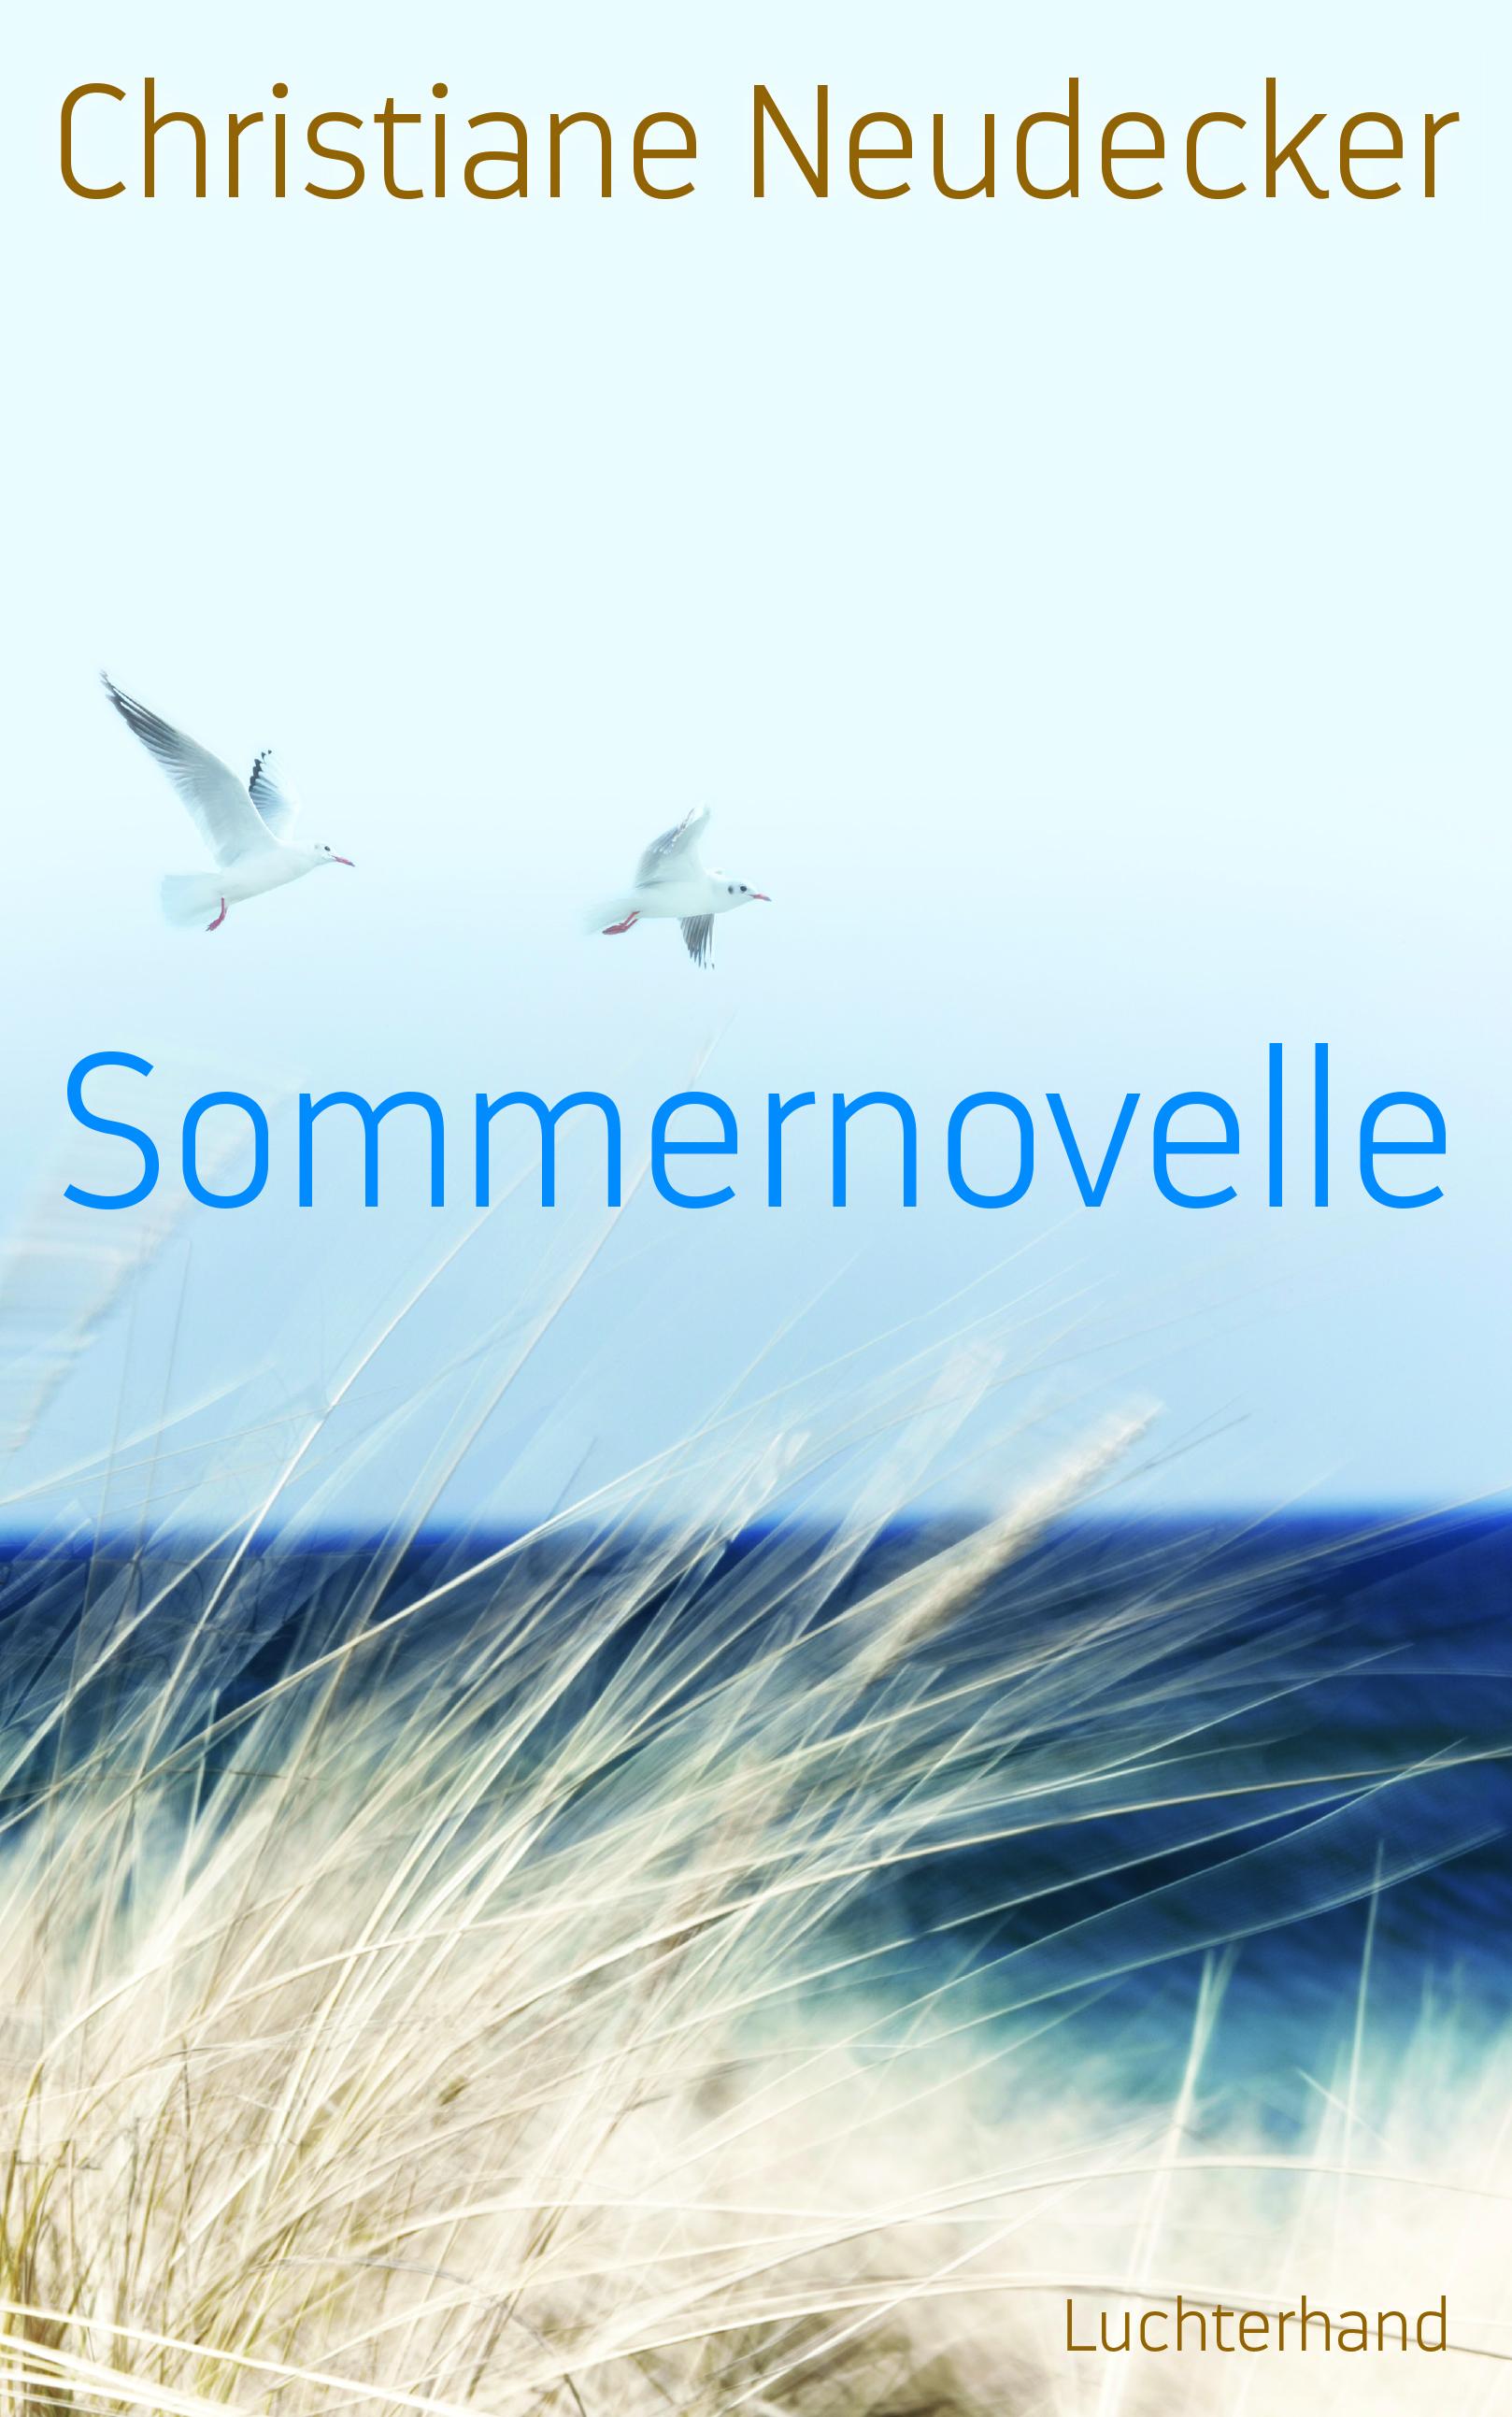 Sommernovelle von Christiane Neudecker